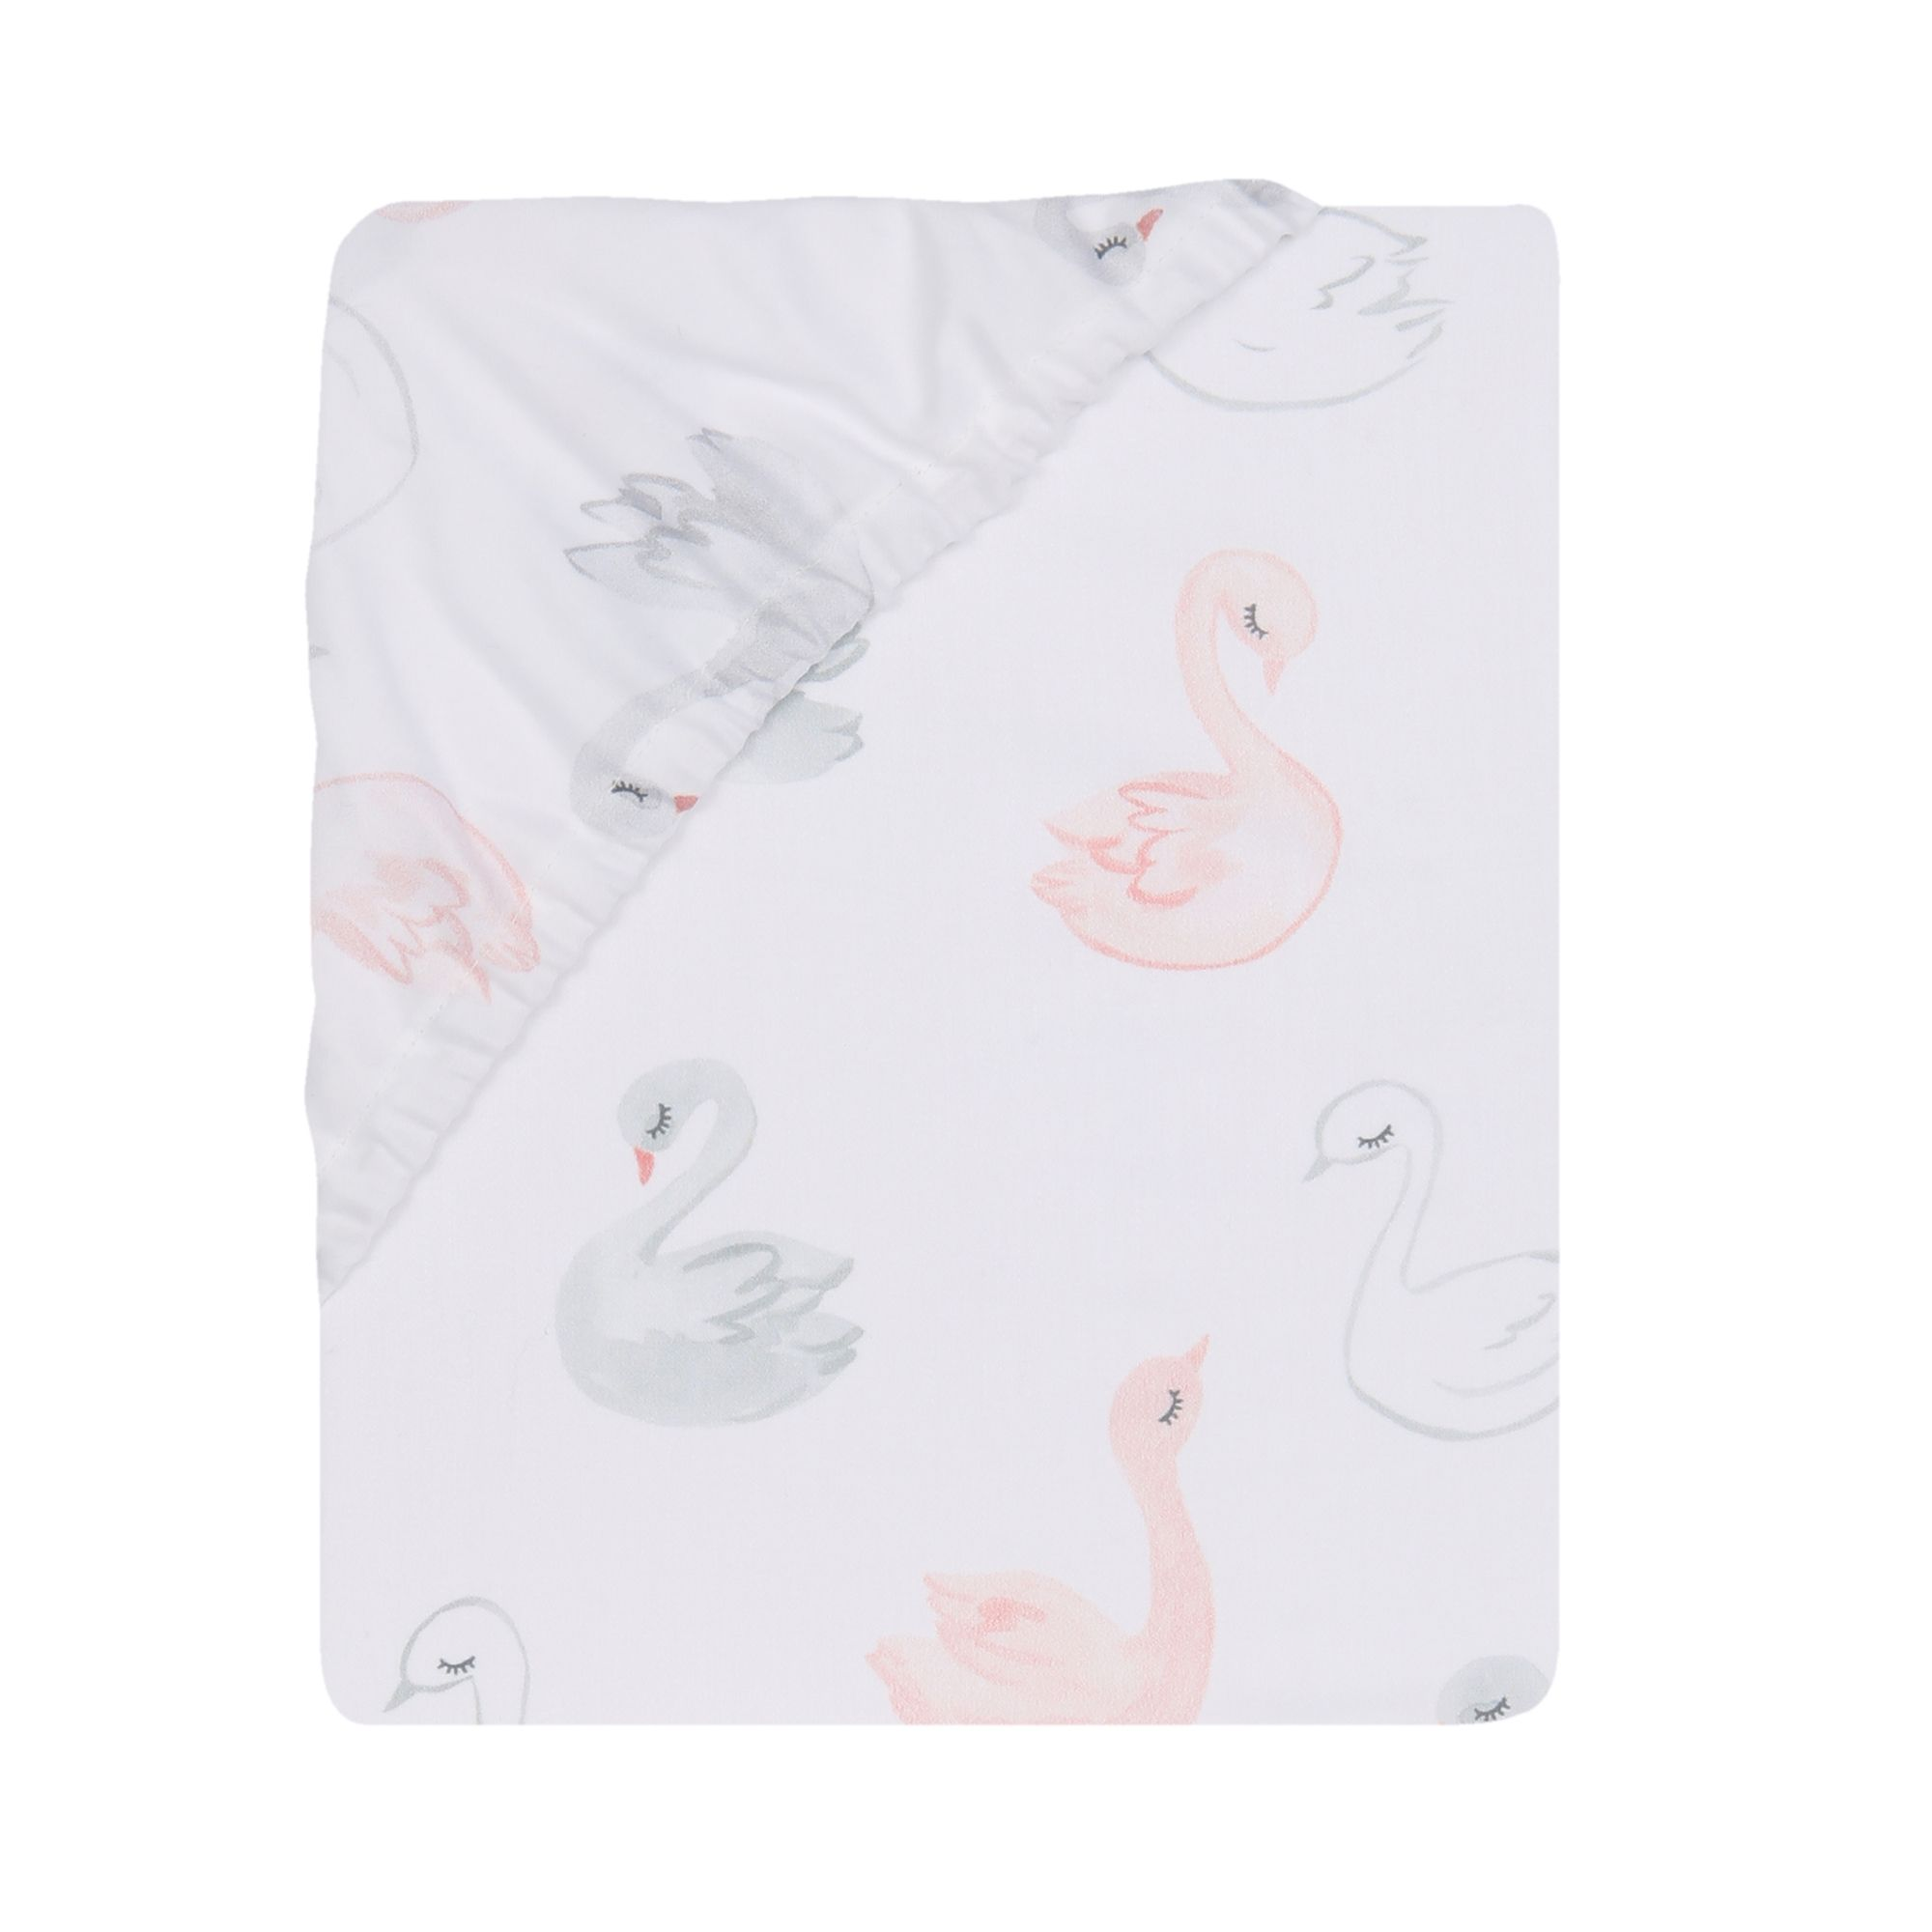 Swans Baby Blanket Cotton Crib Sheet Girl Baby Shower Crib Sheet Grey Crib Sheet Girl Nursery Swan Crib Sheet Swan Nursery